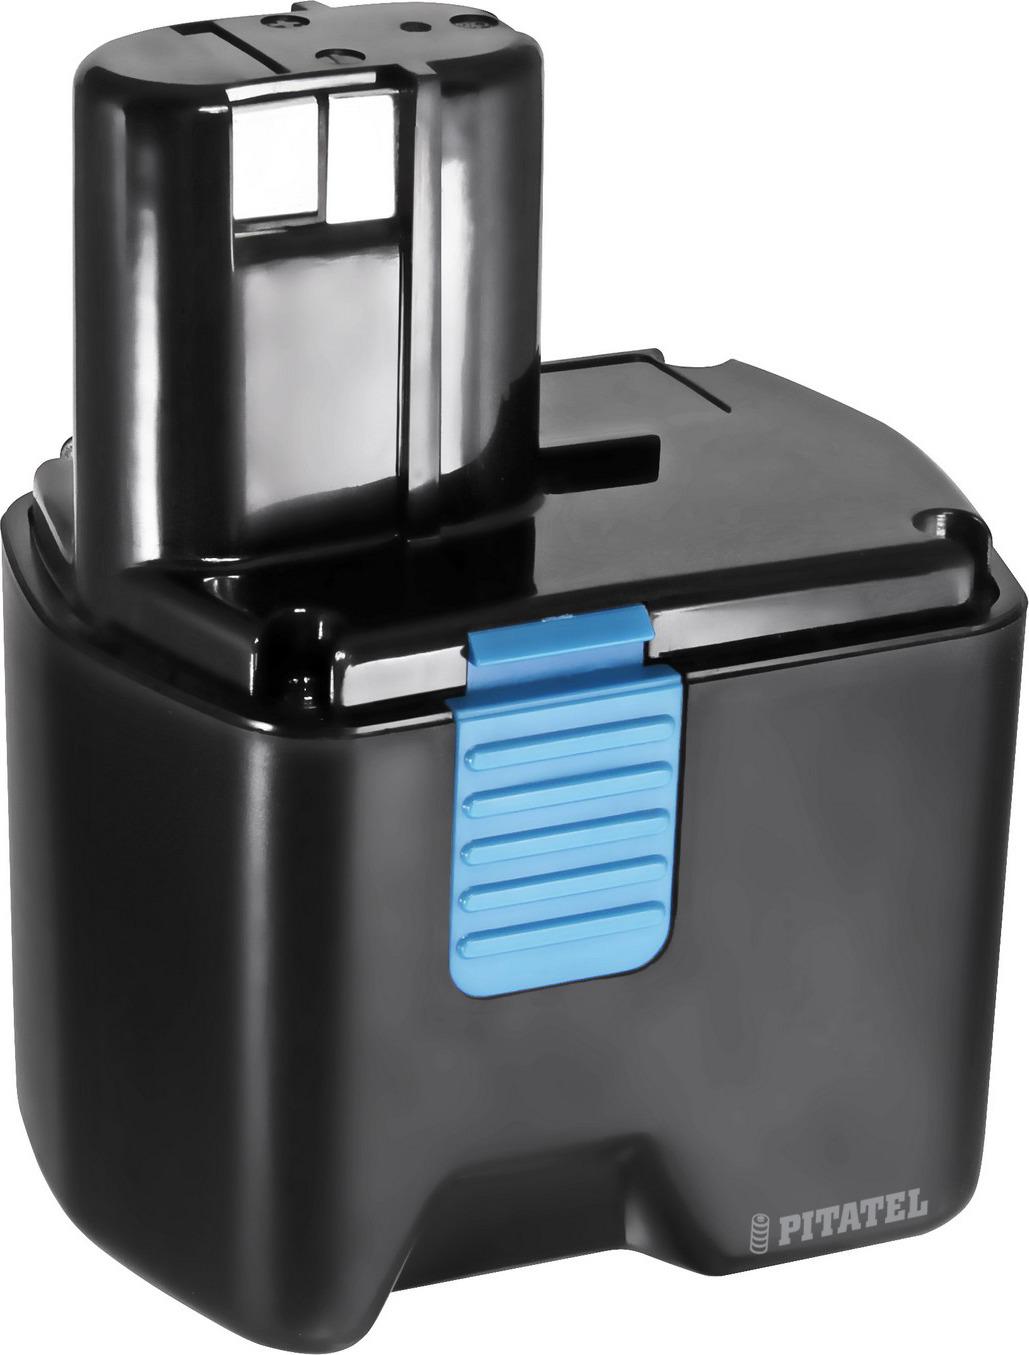 Аккумулятор для инструмента Pitatel для HITACHI. TSB-101-HIT18A-21M аккумулятор для инструмента makita pitatel tsb 038 mak96stick 21m черный